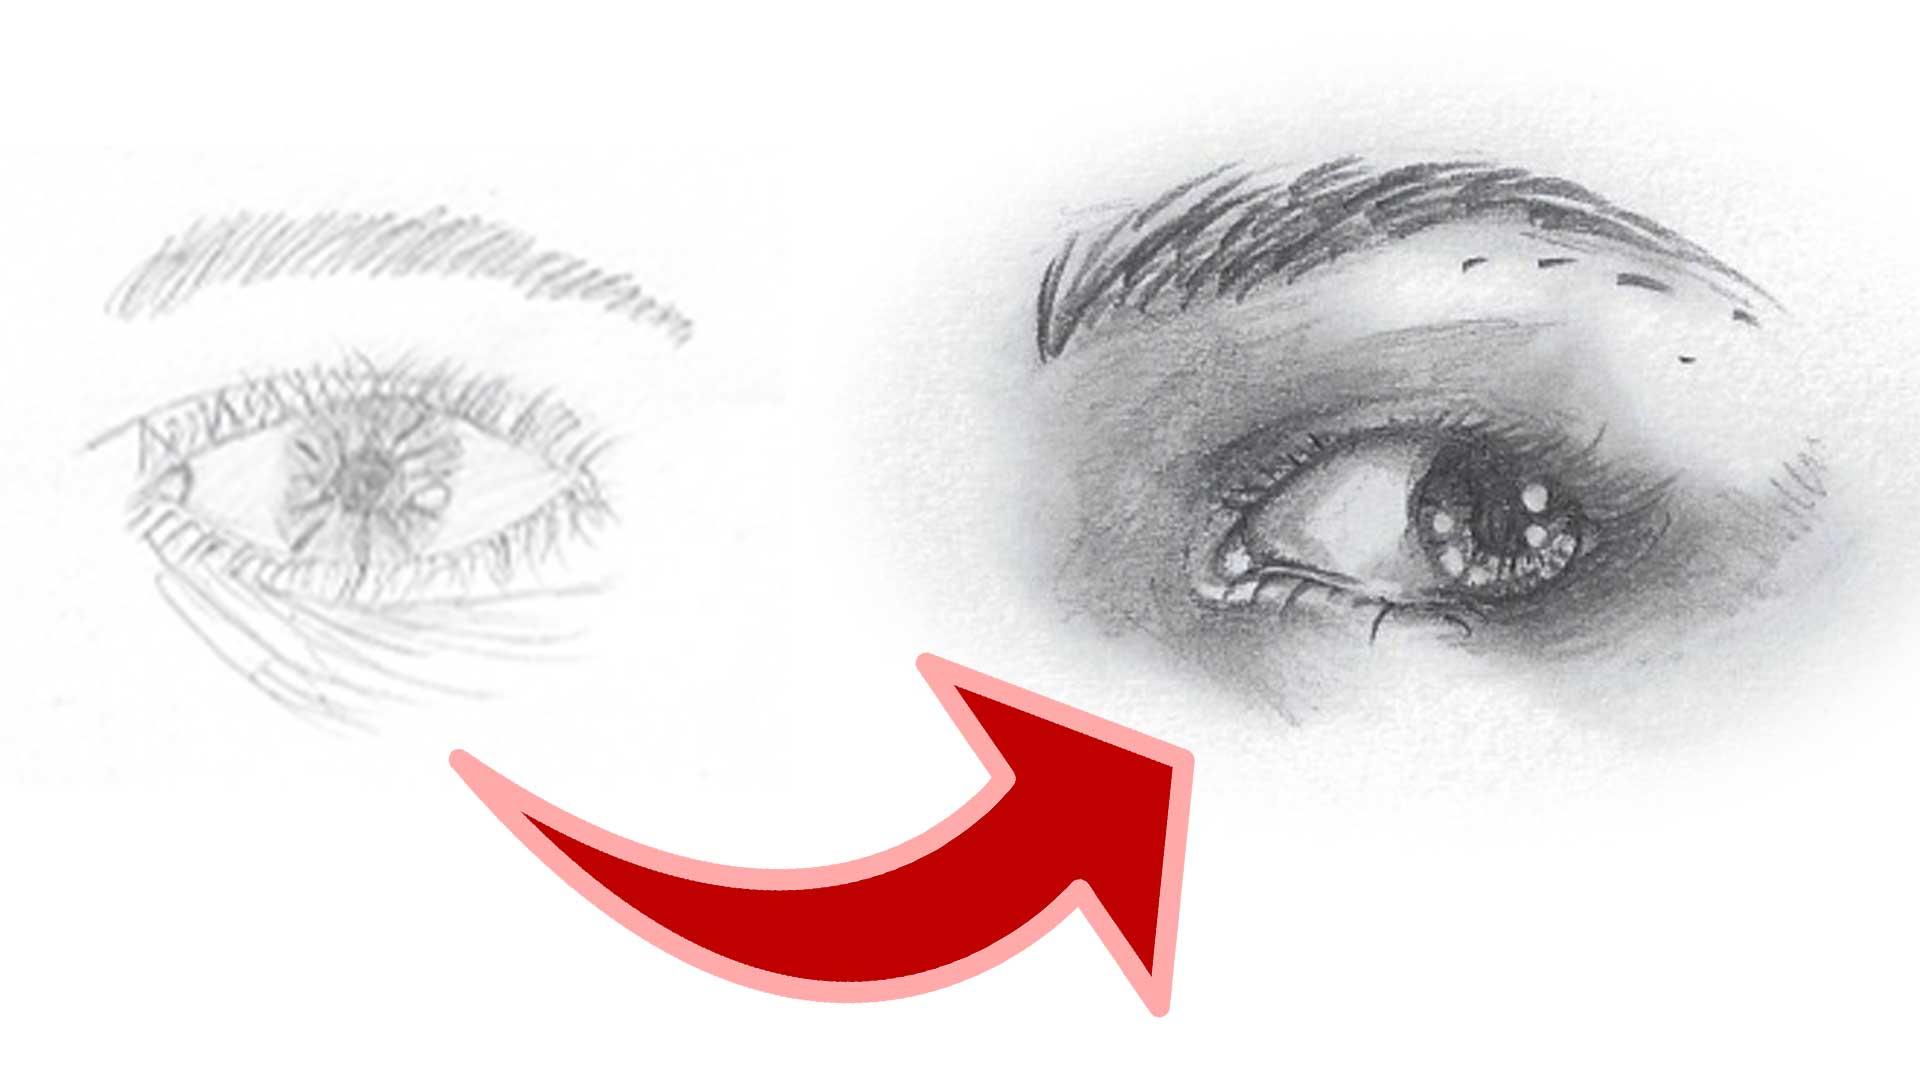 Auge Zeichnen Schritt Fur Schritt Anleitung Fur Meisterhaftes